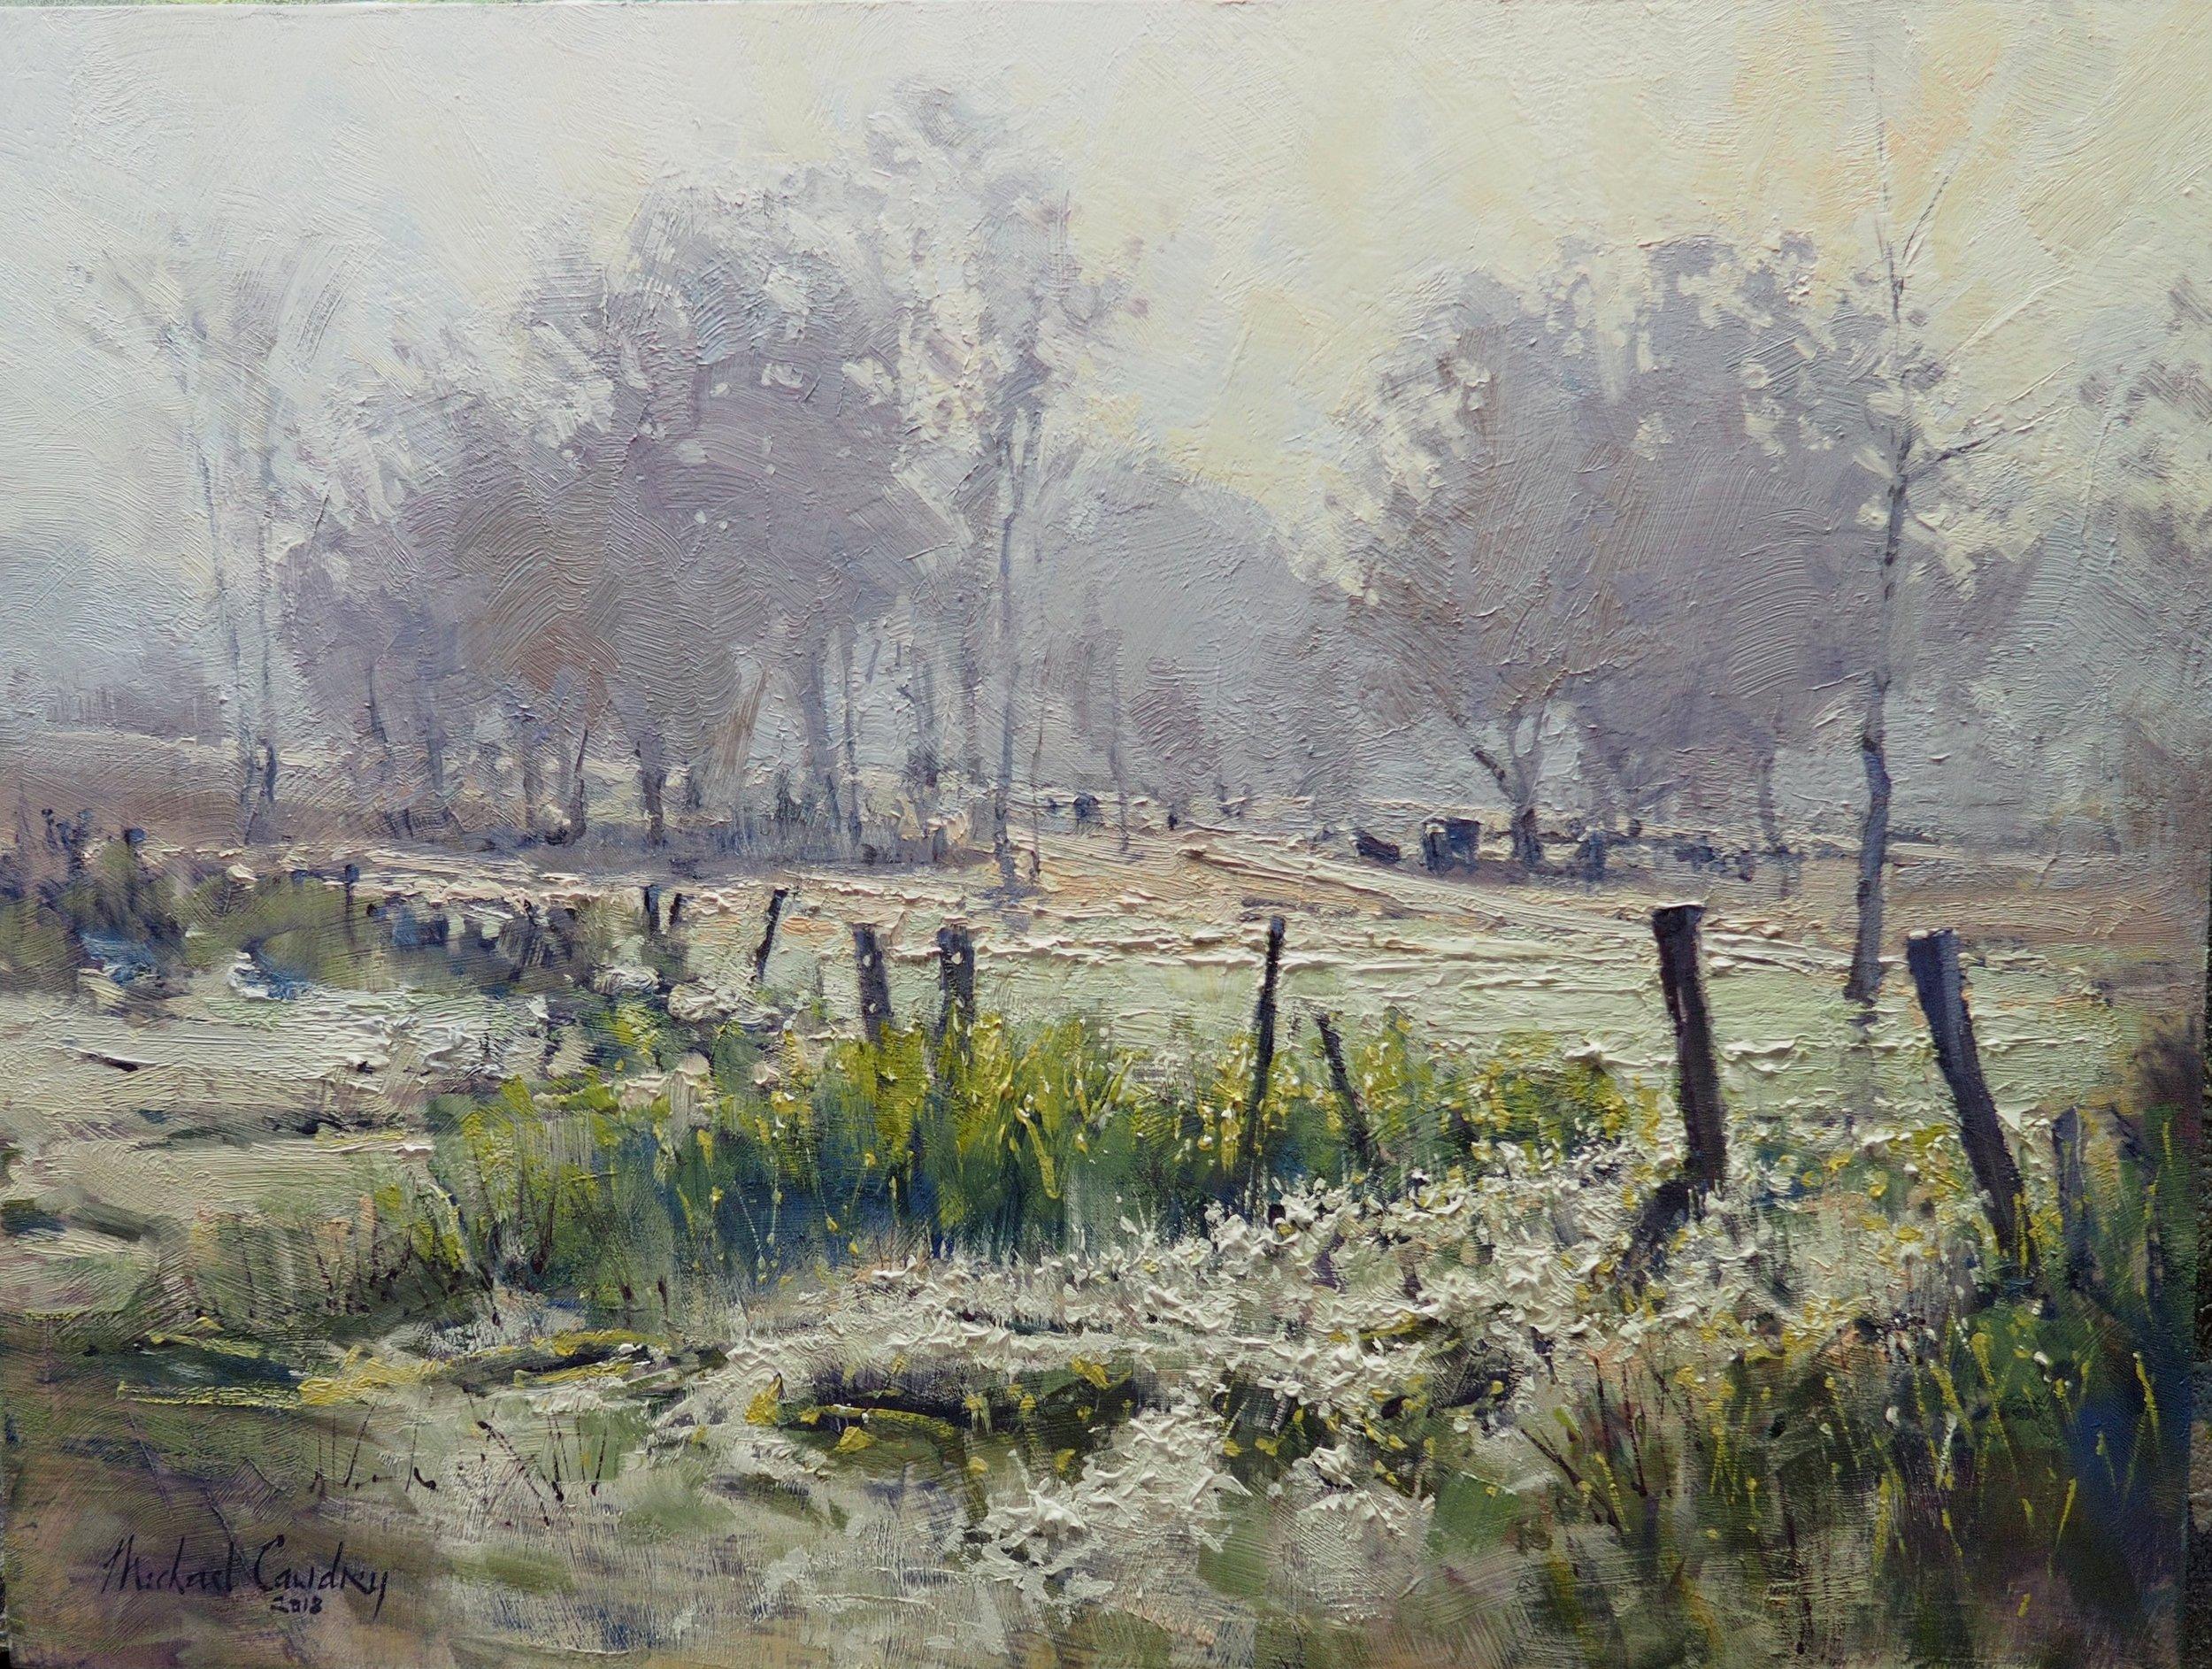 Morning Dew and Mist - Michael Cawdrey.jpg